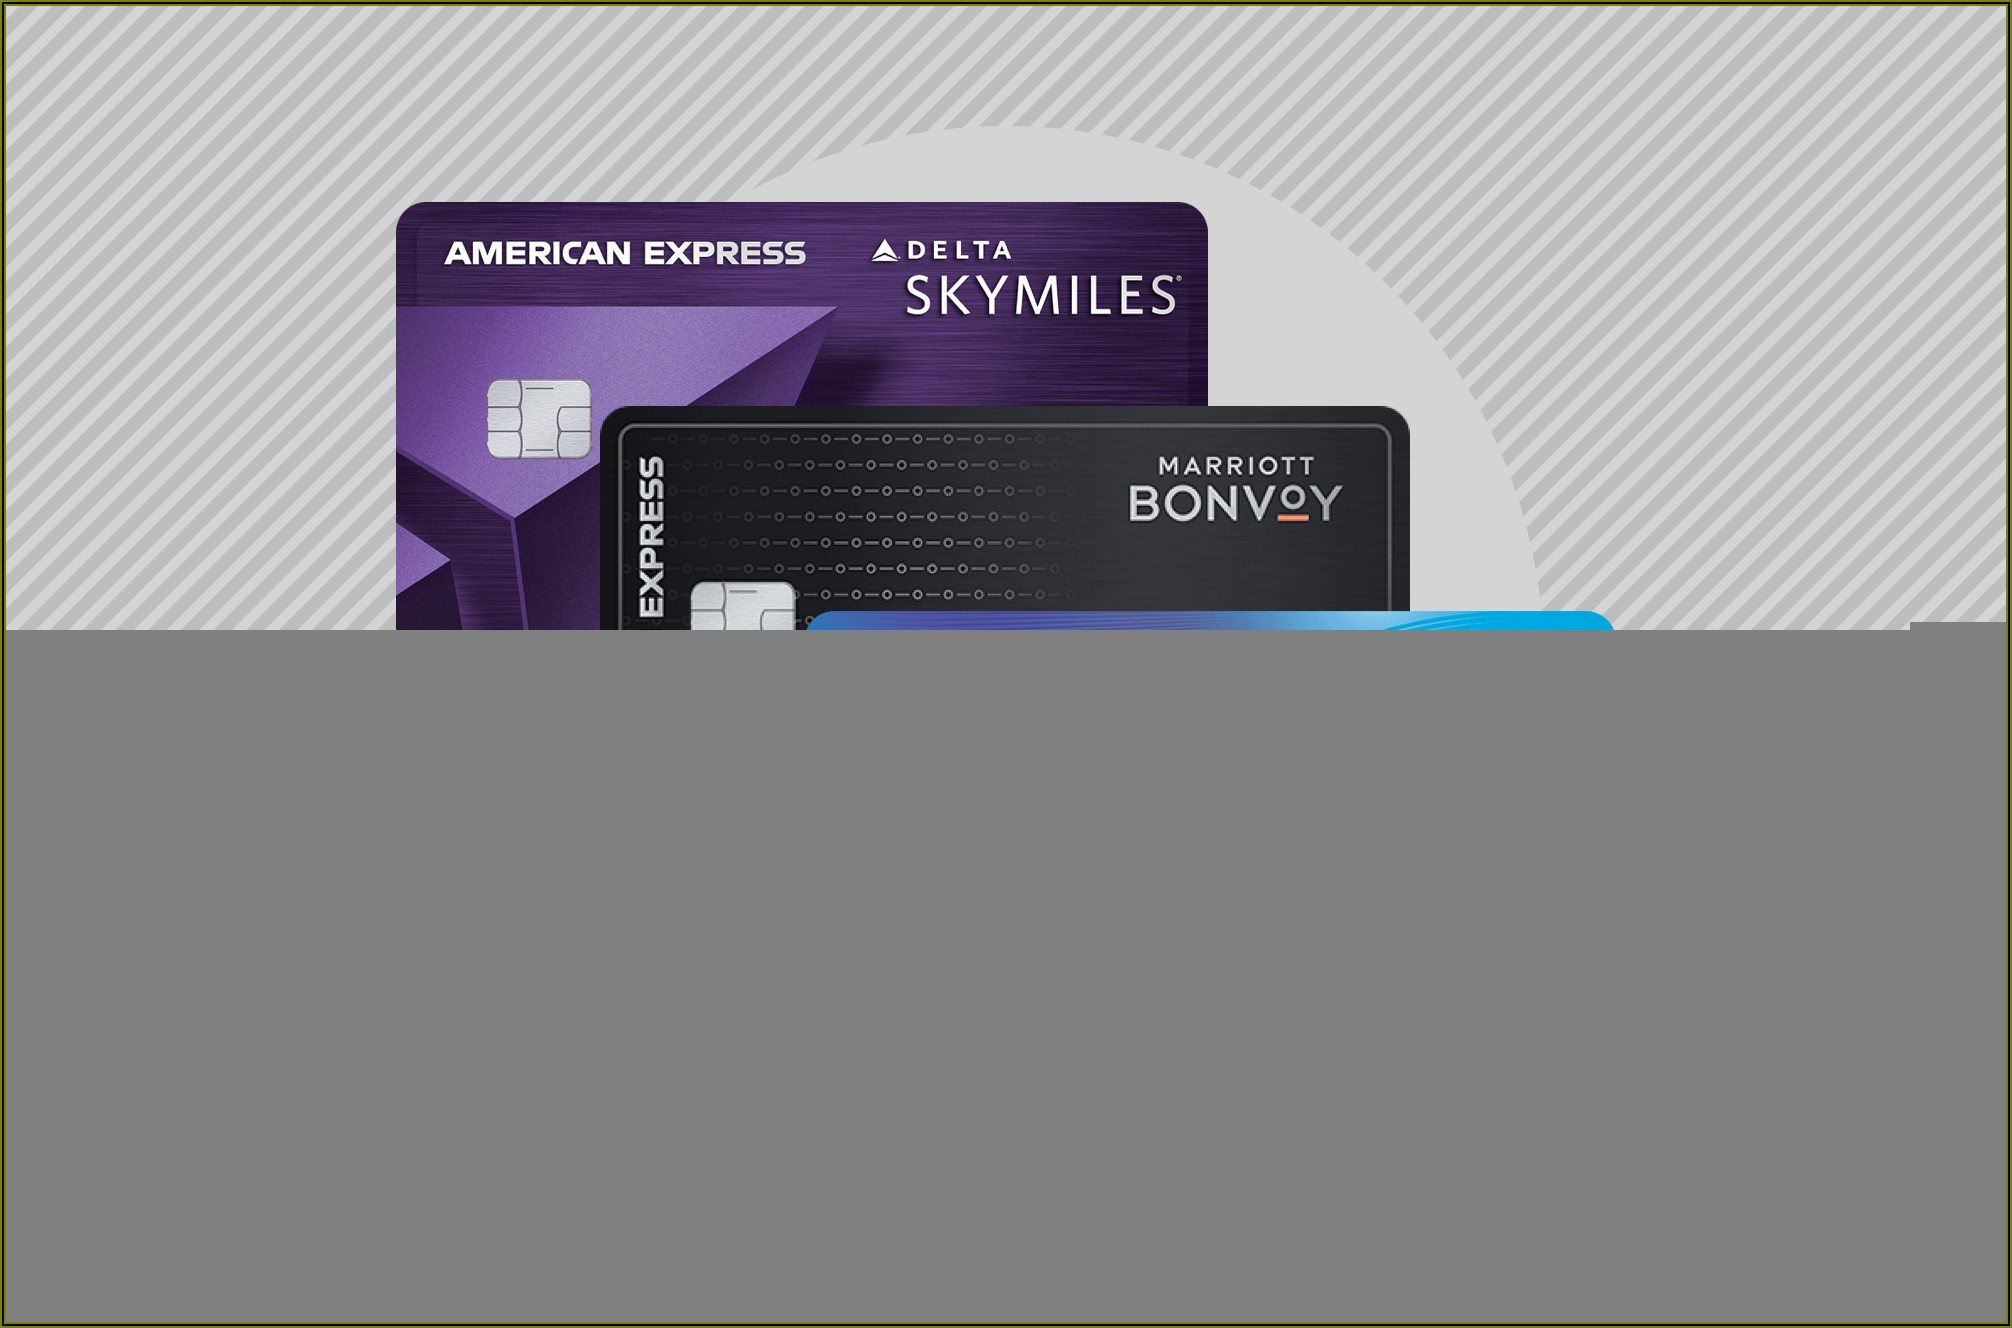 Hilton Business Card Benefits